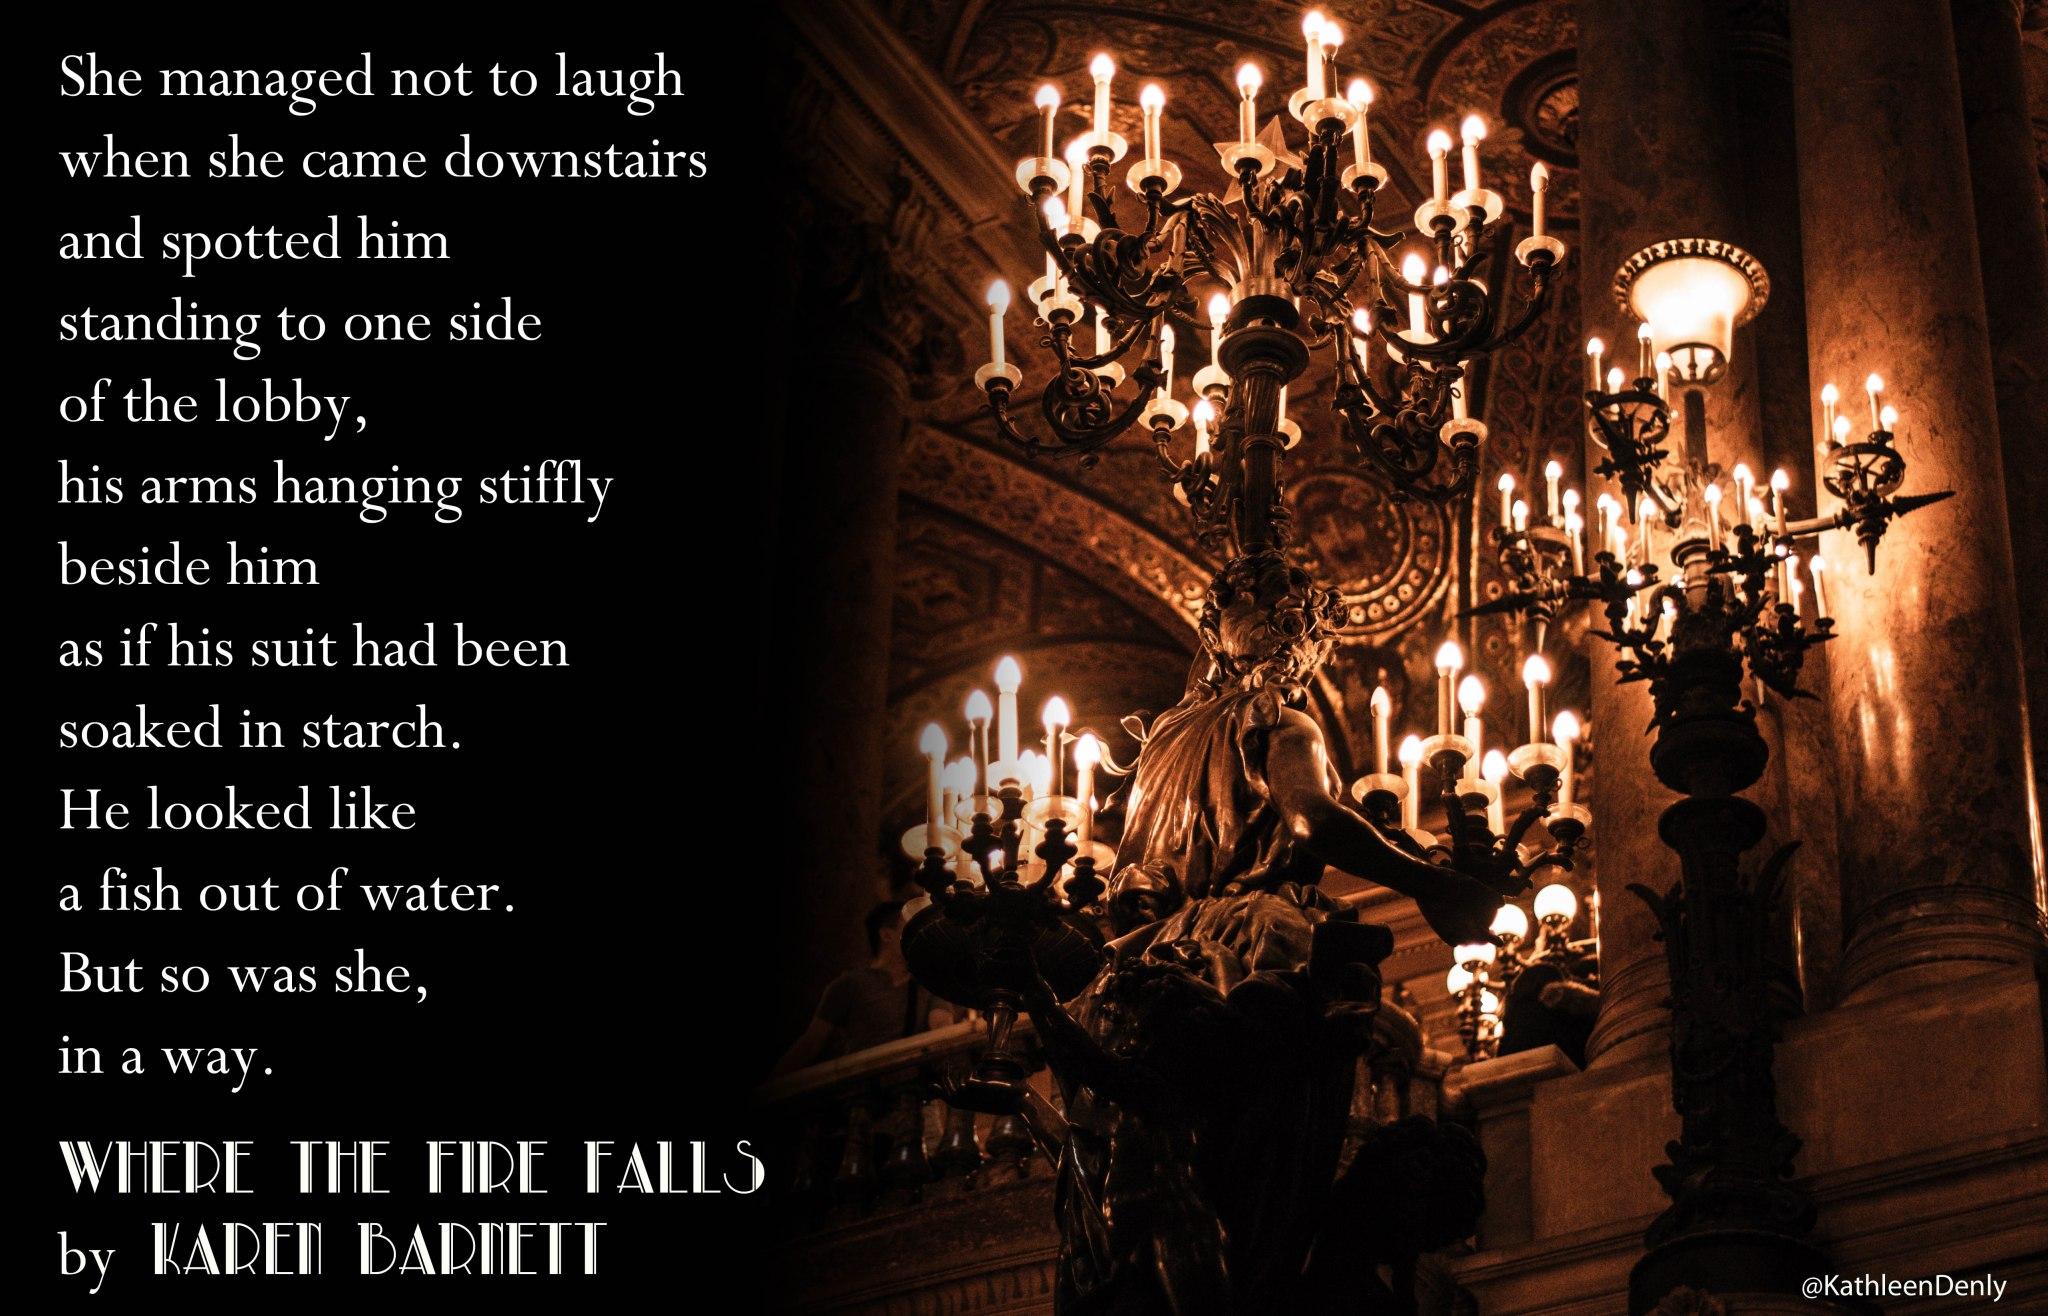 Book Quote - Where the Fire Falls - Stiff Suit